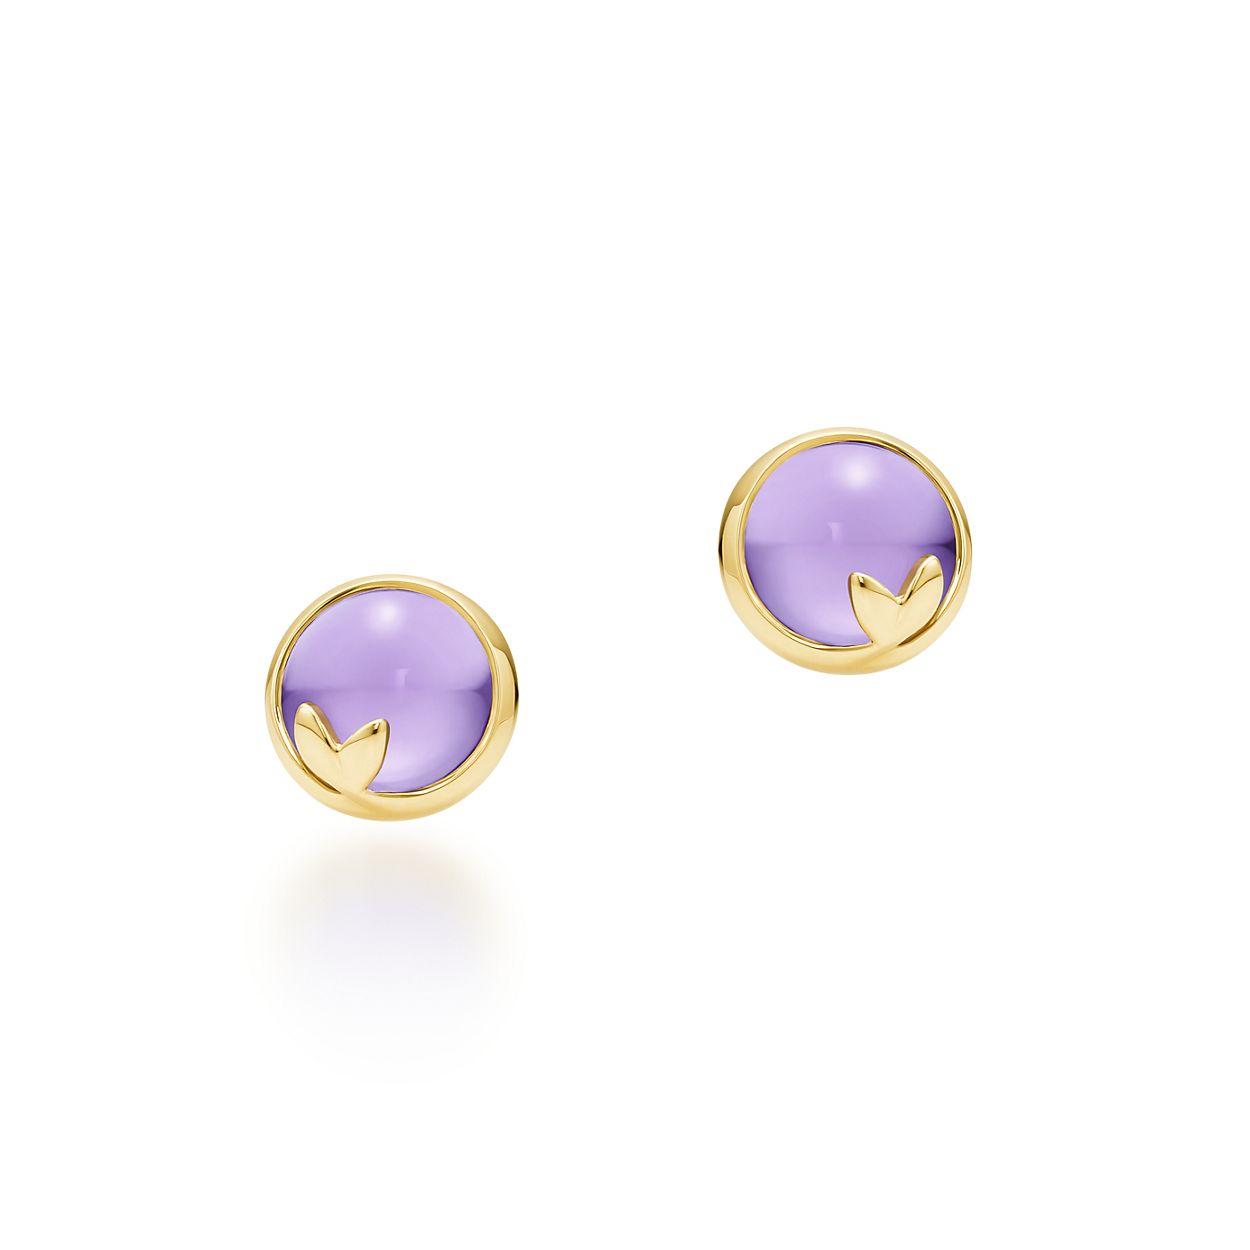 Paloma Pico Olive Leaf Earrings